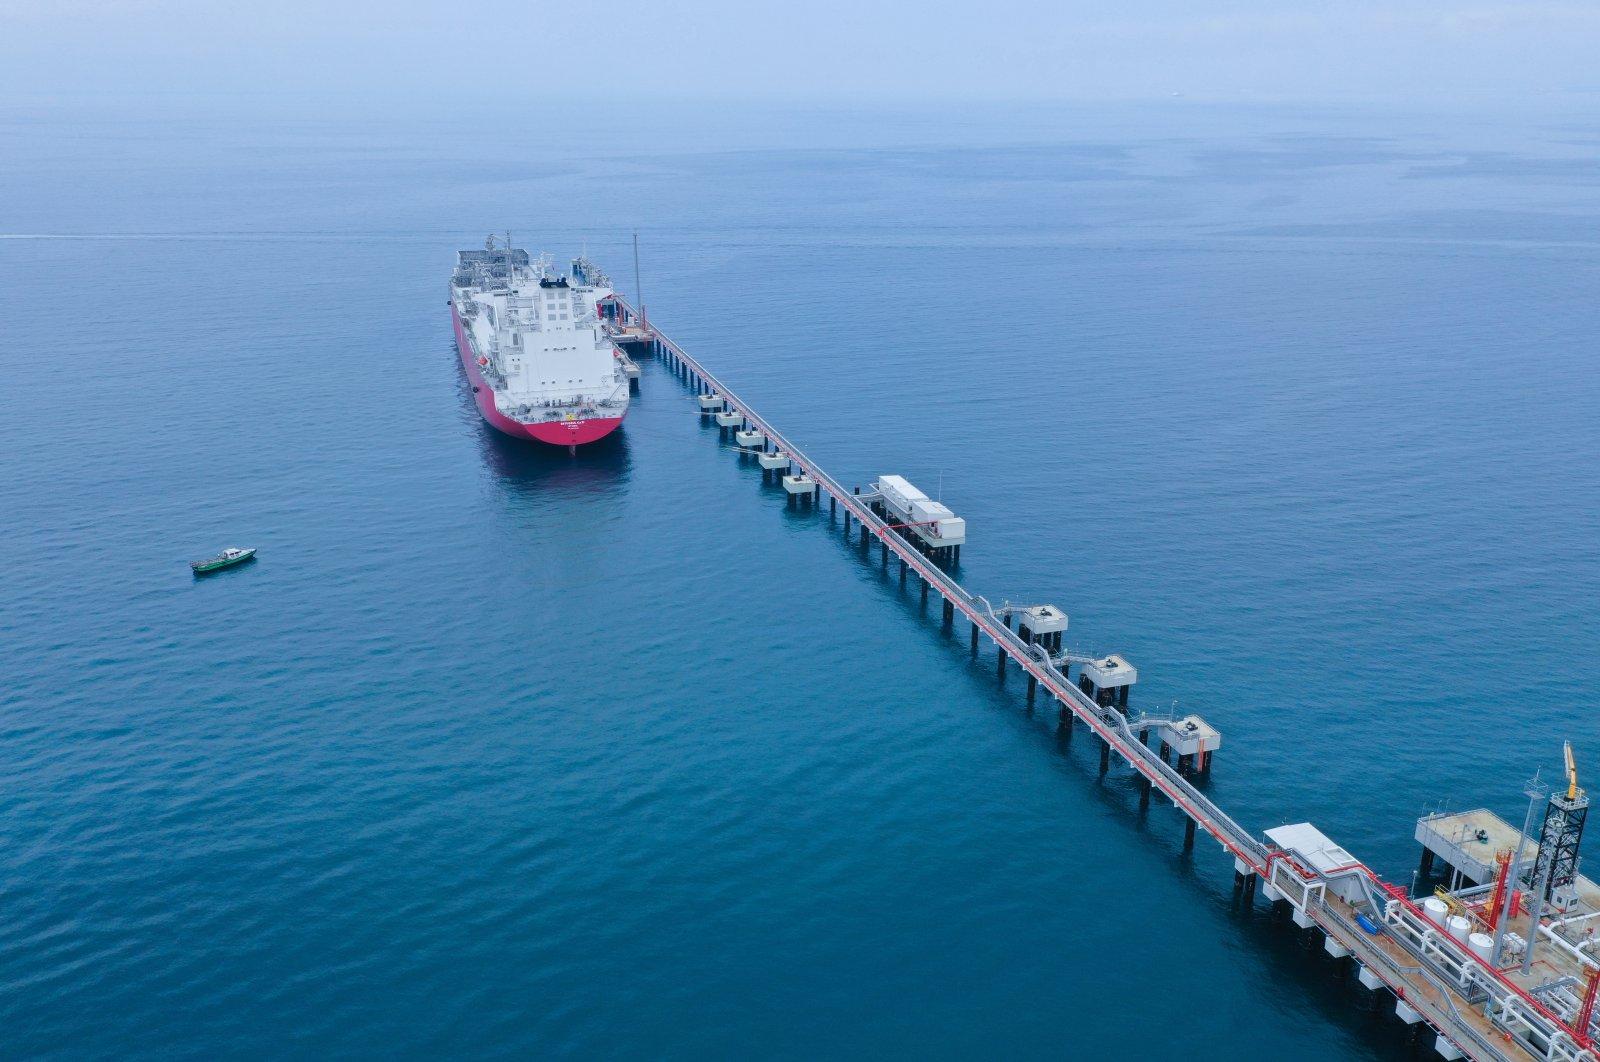 Turkey's first floating storage and regasification unit (FSRU) Ertuğrul Gazi is seen at the port in Dörtyol in Turkey's southern province of Hatay, Turkey, June 24, 2021. (AA Photo)